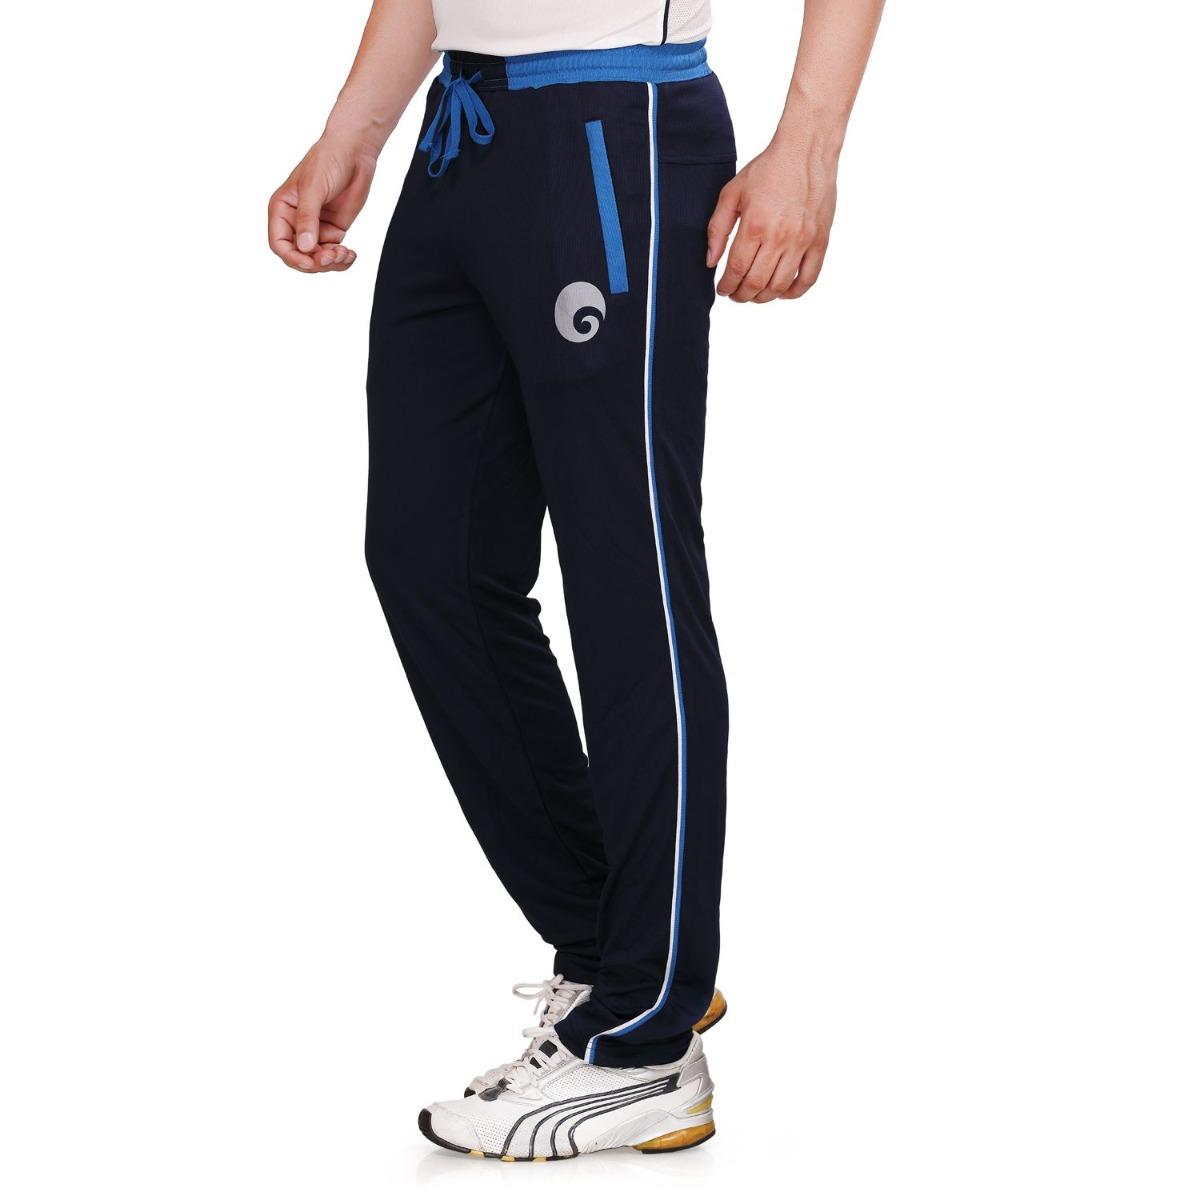 Royal Track Pants - 07 - Black Blue